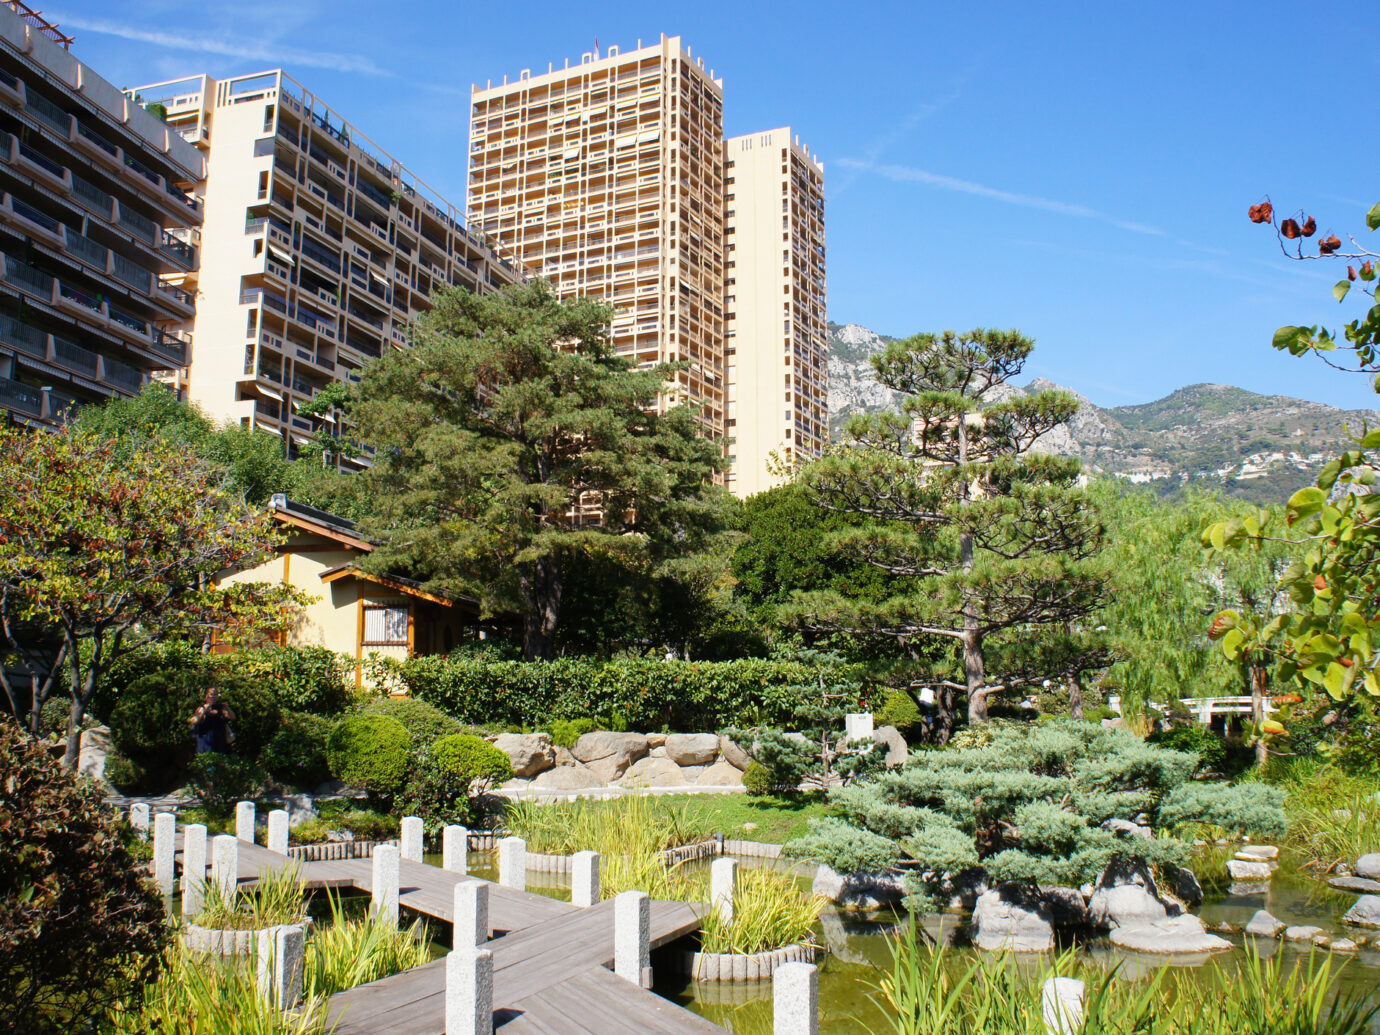 Japanese garden in Monaco landscape